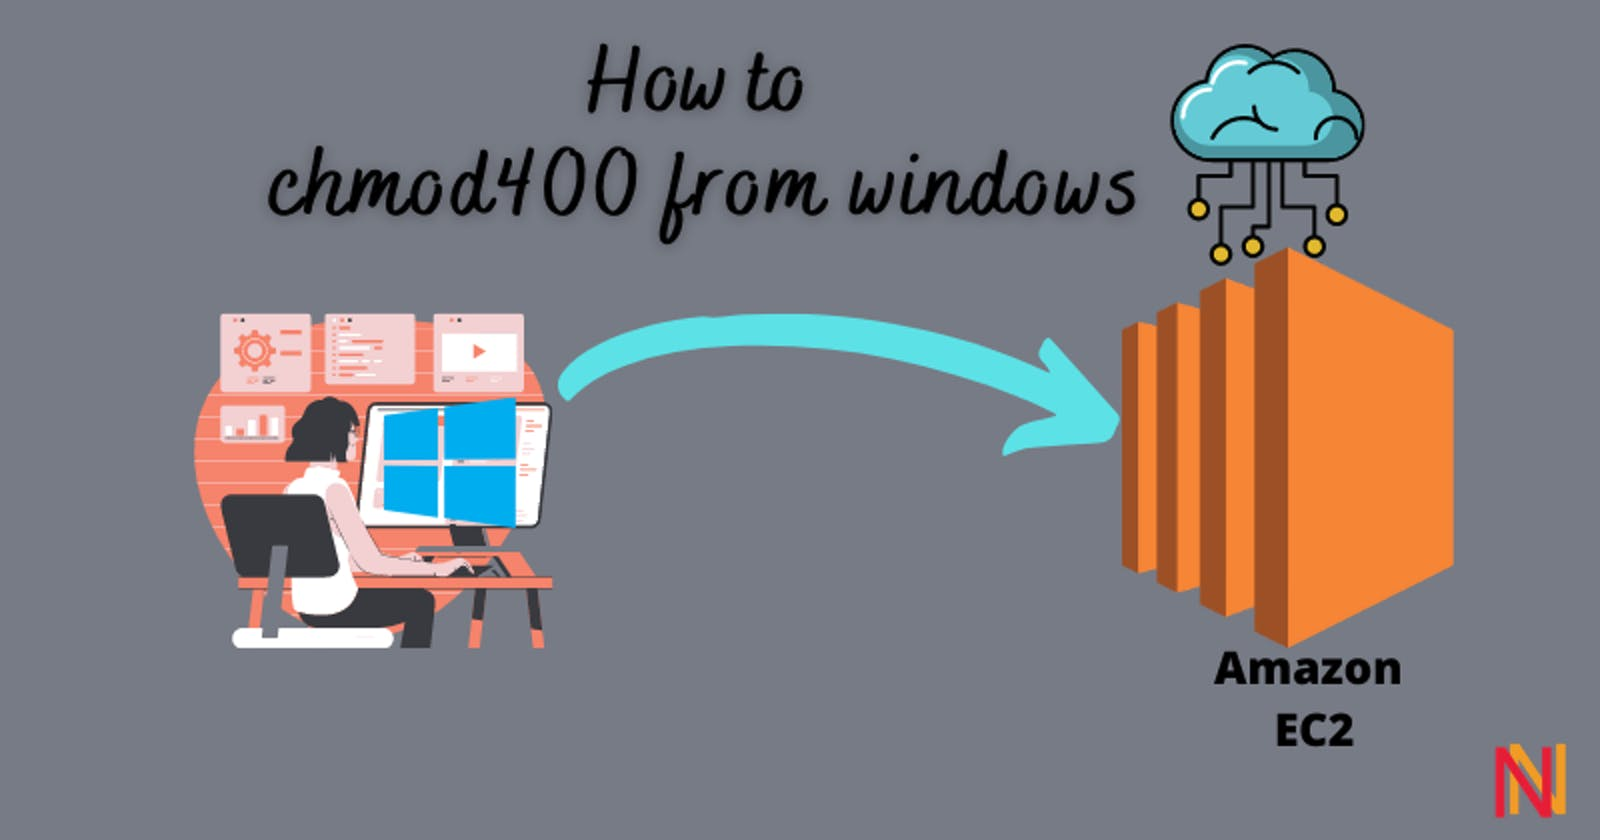 How to run the chmod400 command on Windows